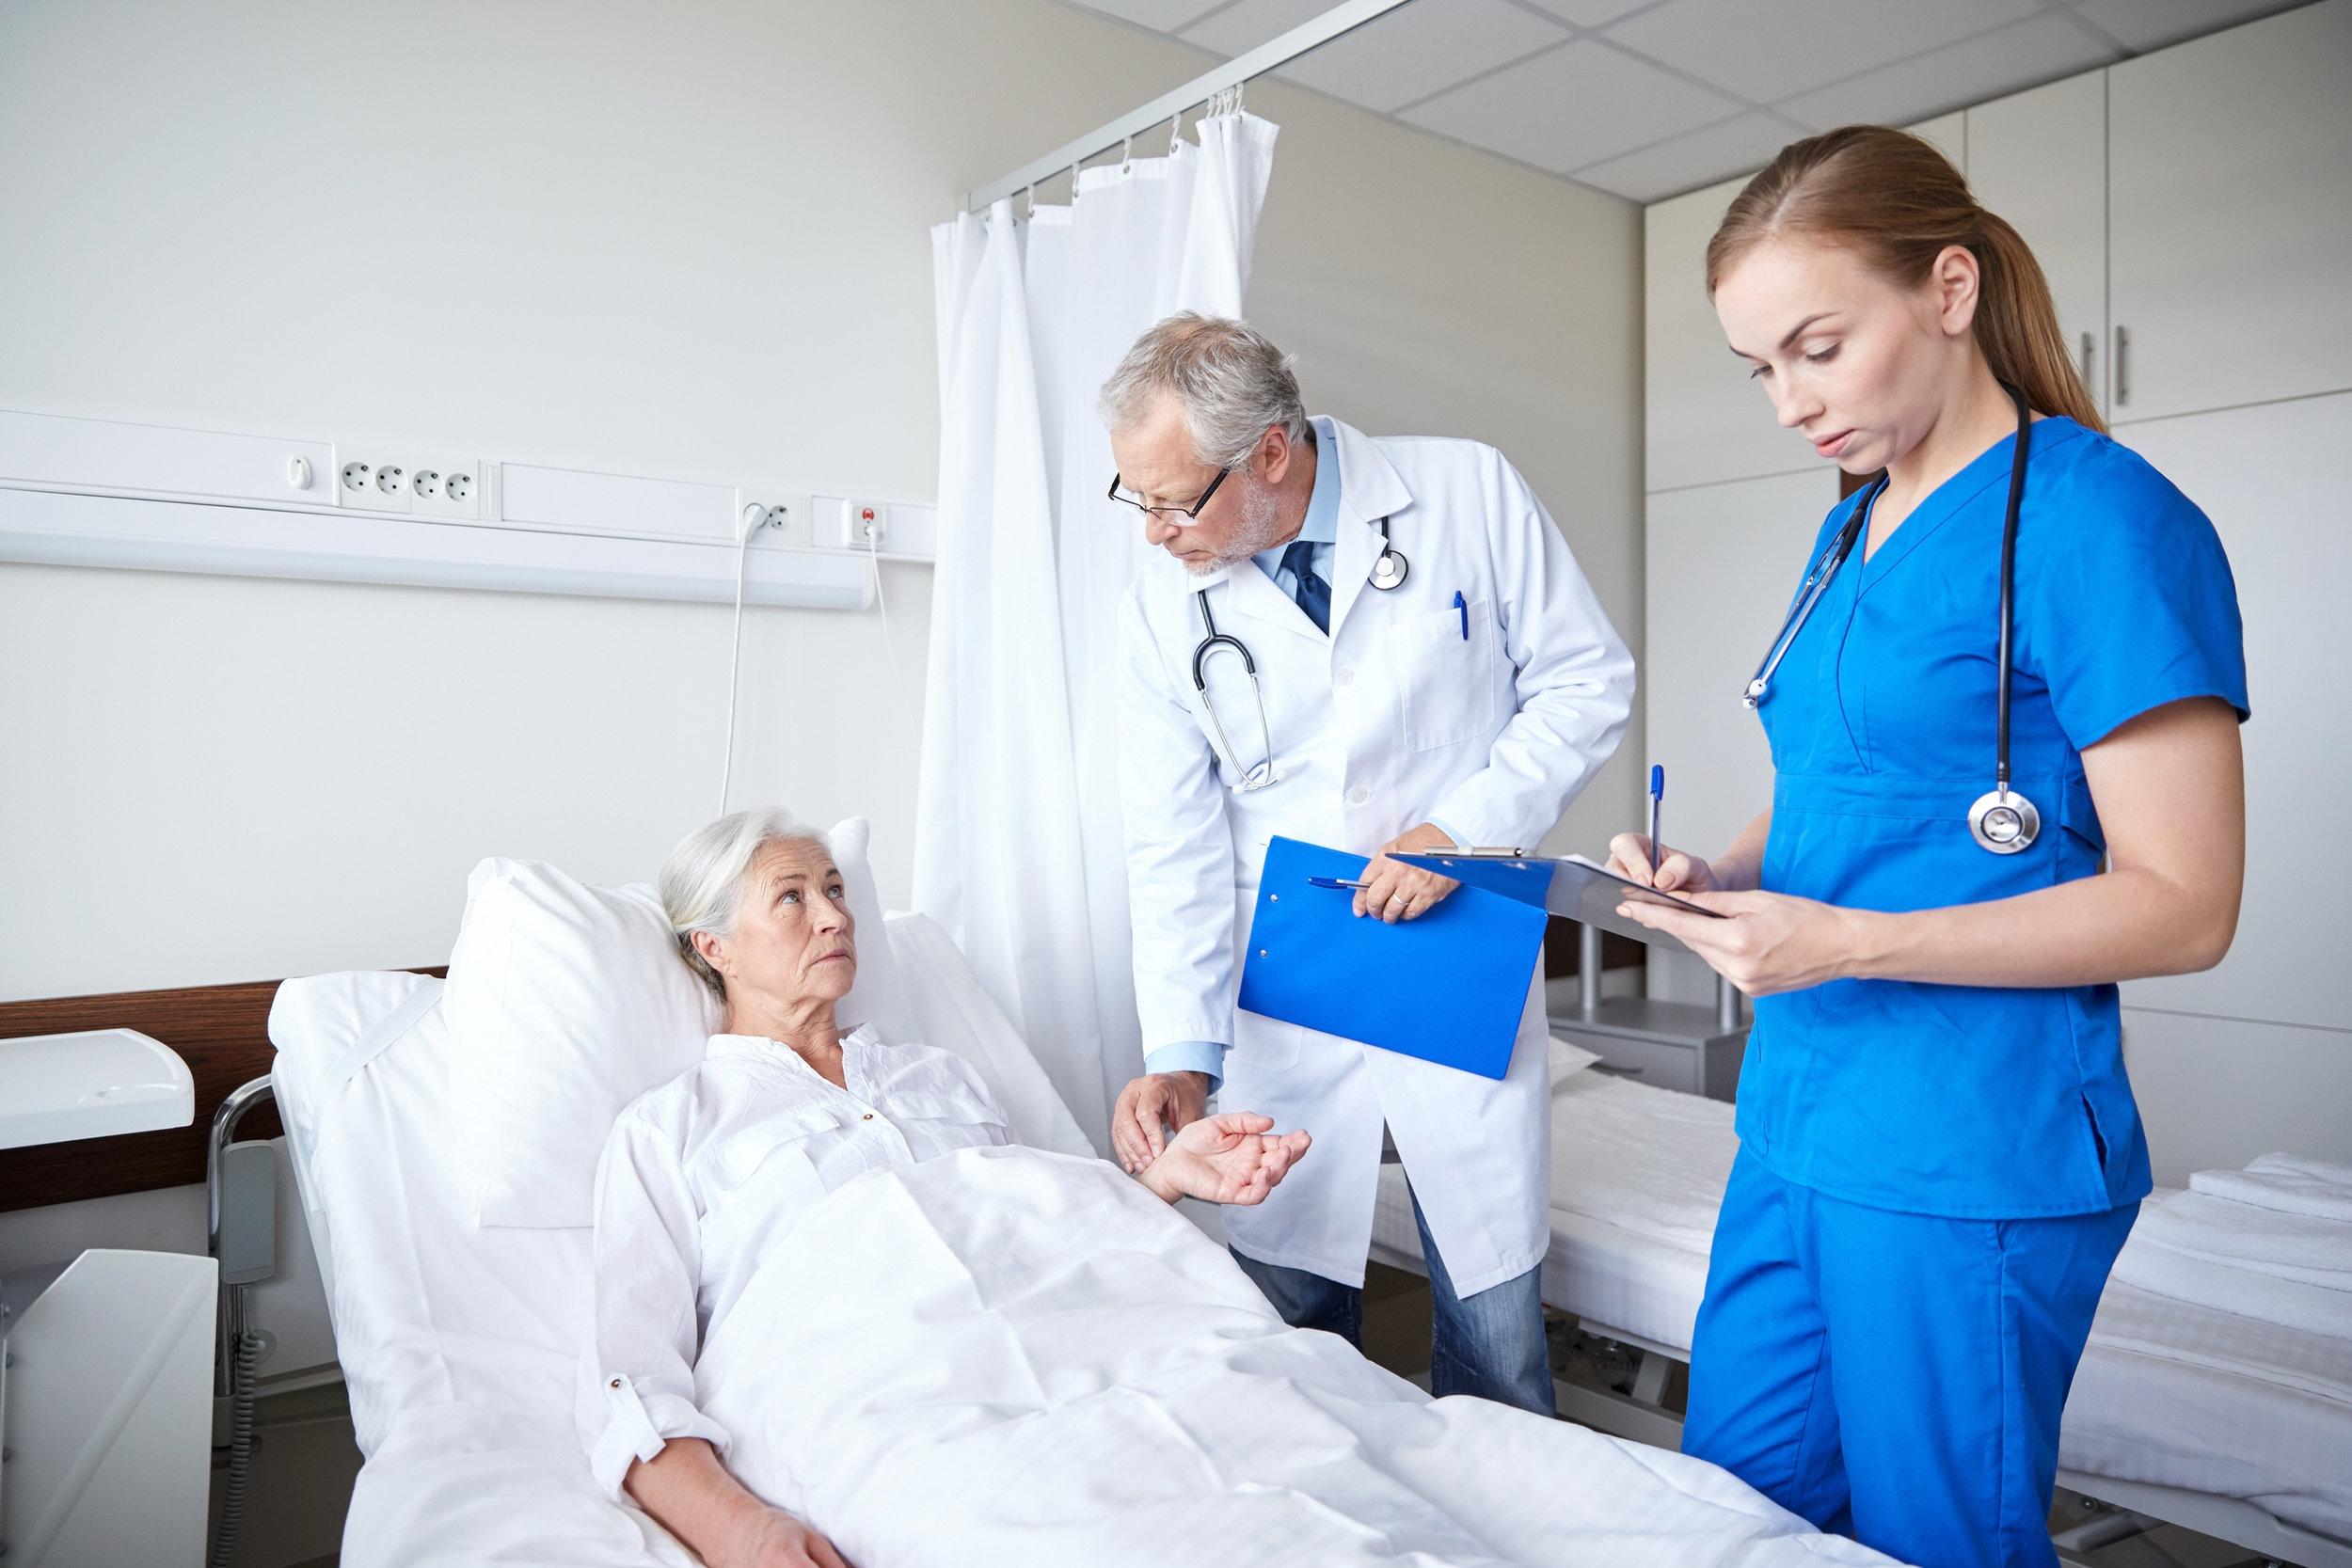 labor-visibility-hospitals.jpg